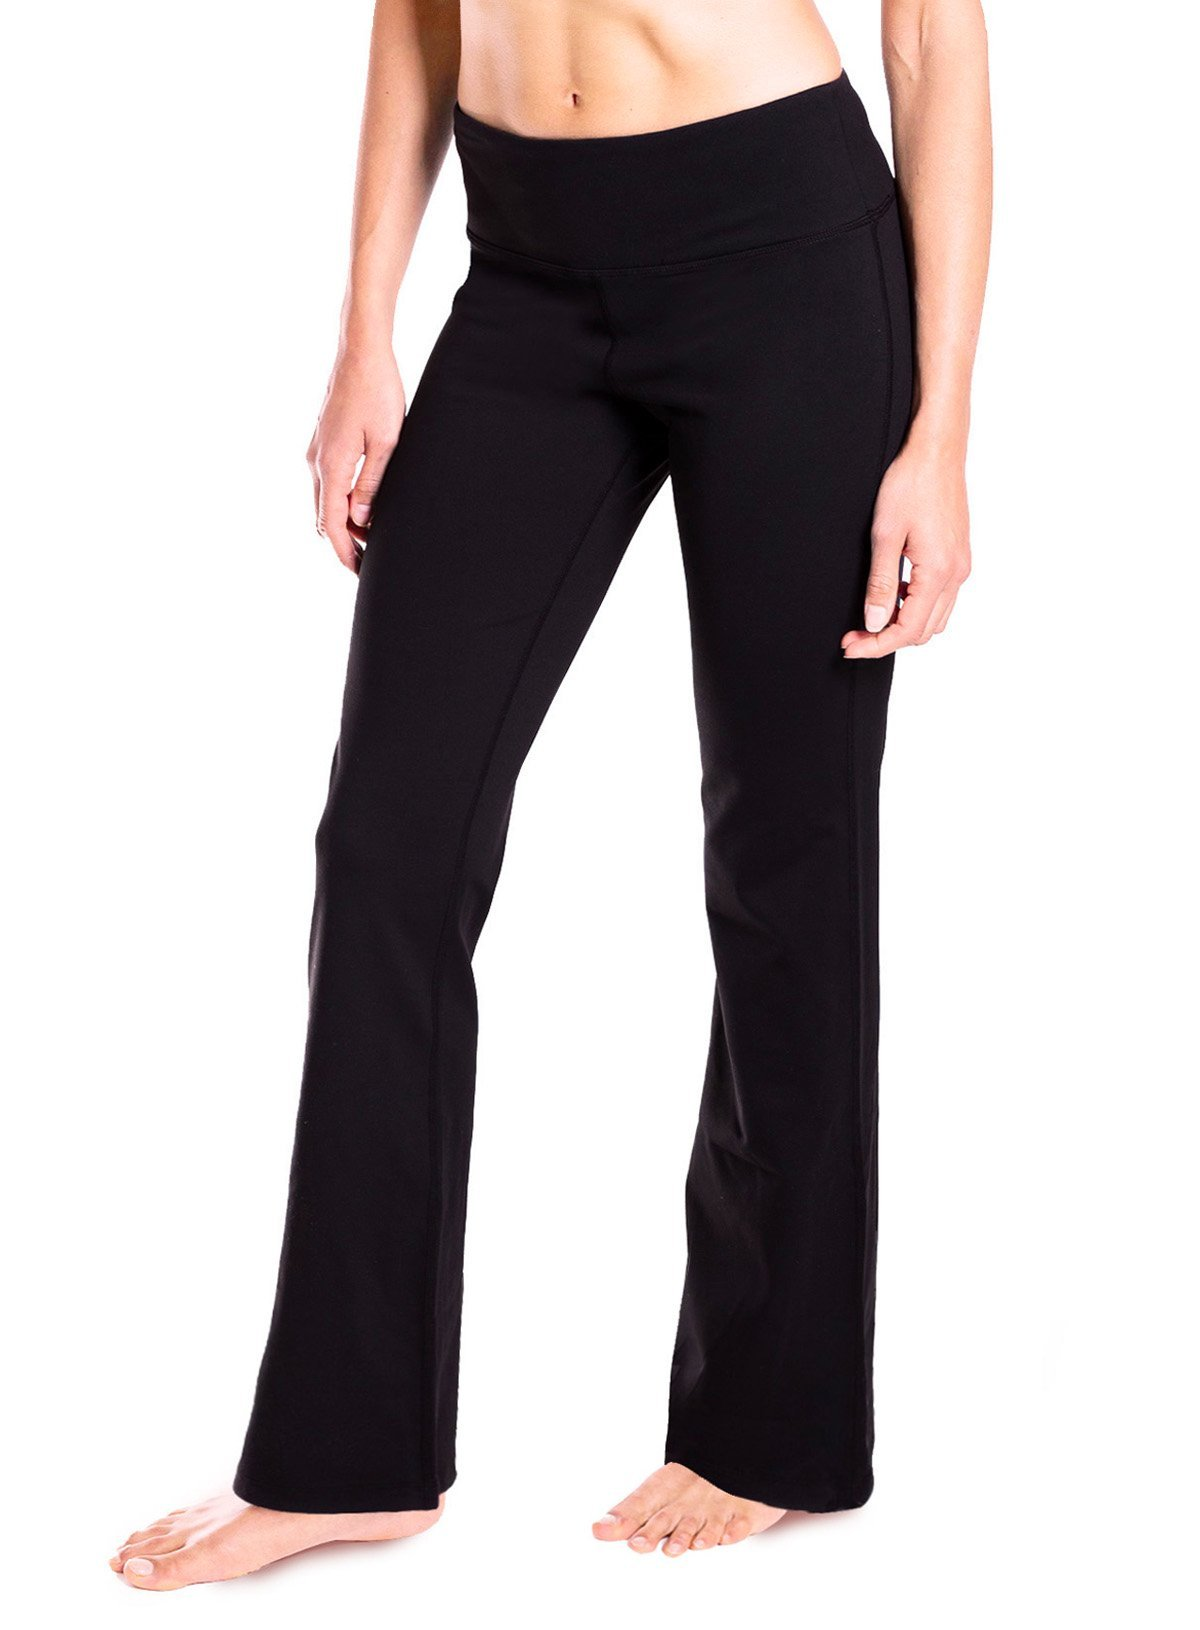 Yogipace 27''/28''/29''/30''/31''/32''/33''/35''/37'' Inseam,Petite/Regular/Tall, Women's Bootcut Yoga Pants Long Workout Pants, 28'', Black Size XS by Yogipace (Image #2)